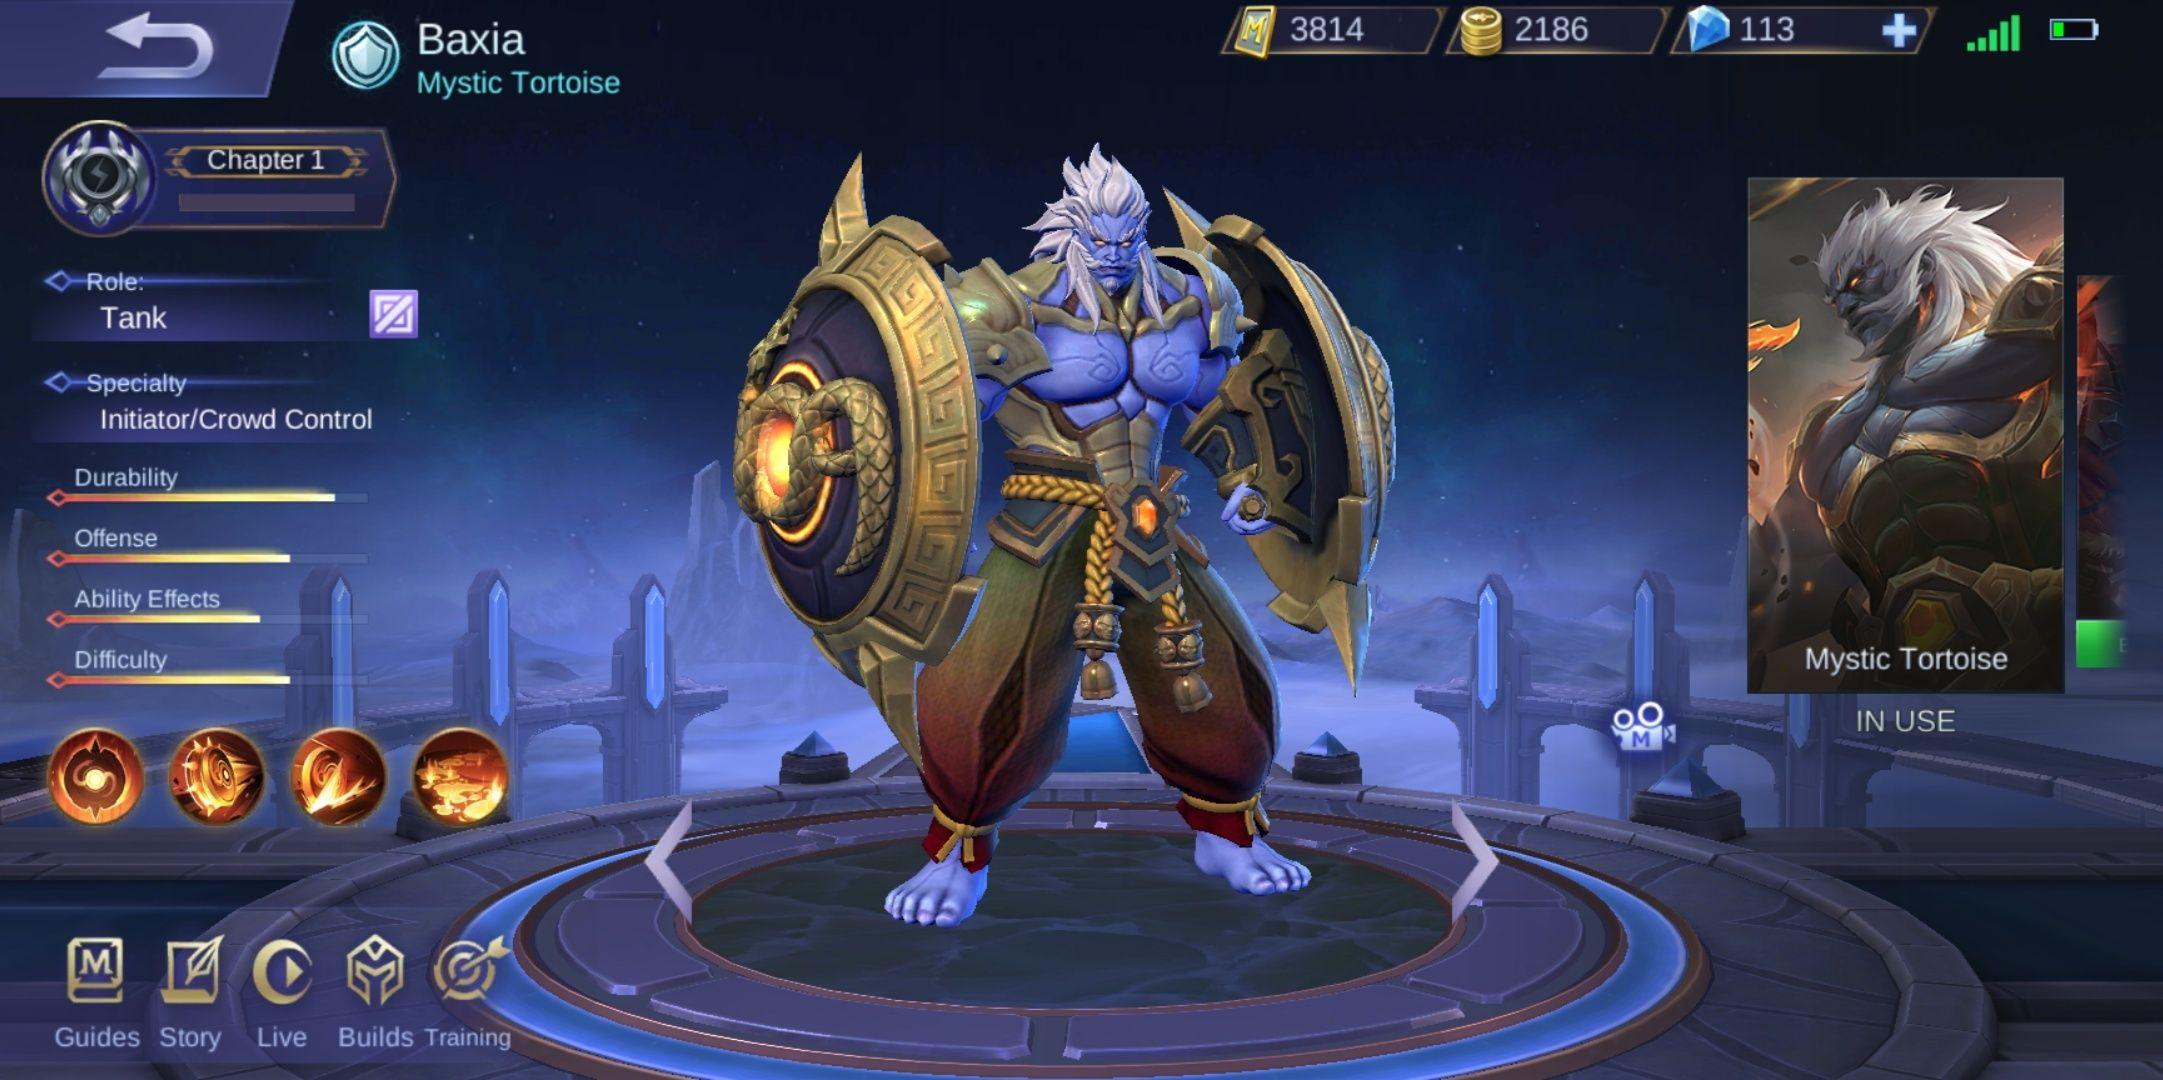 Baxia Mobile Legends